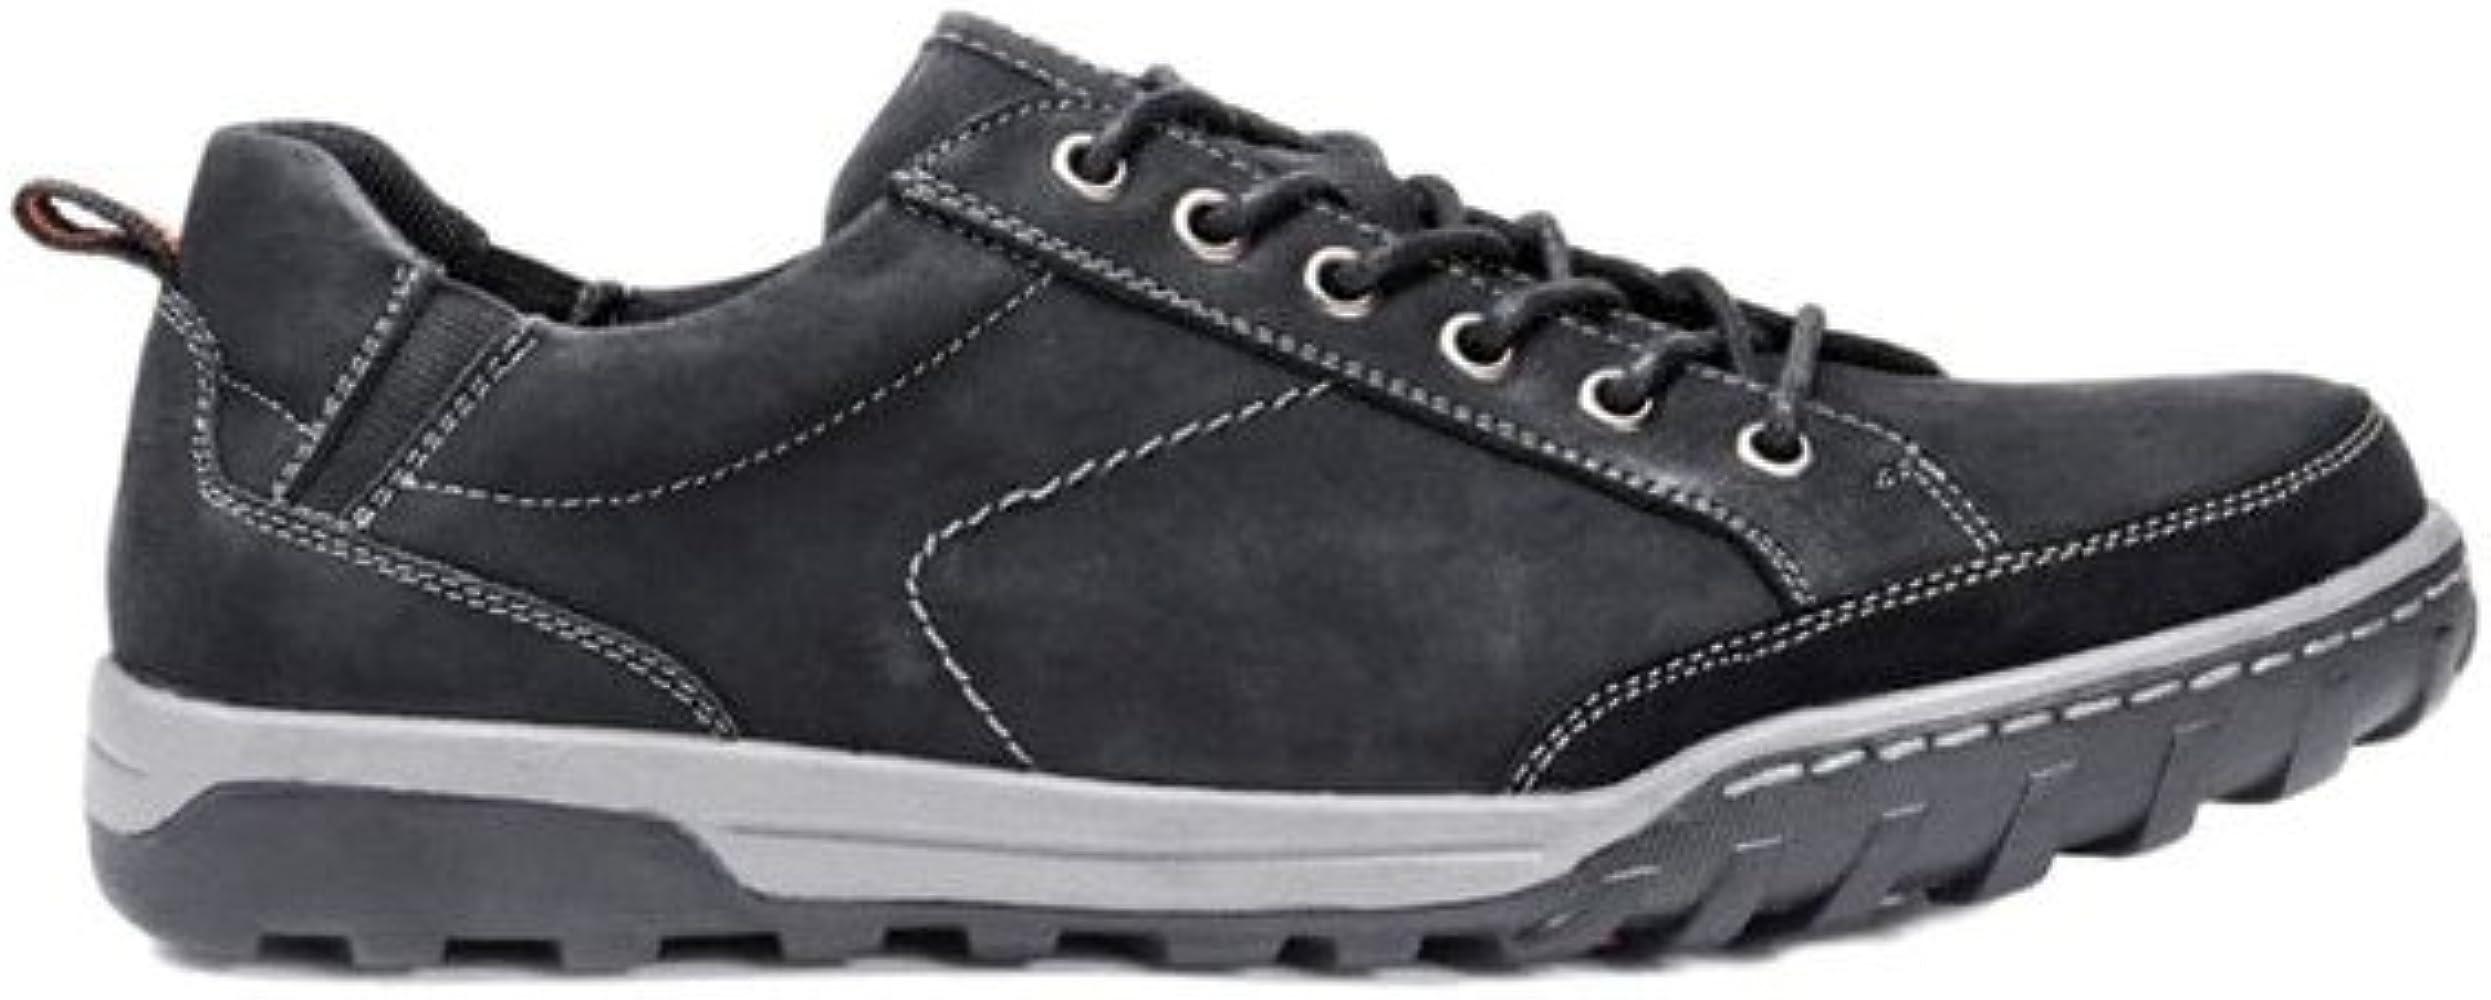 Details about  /MUK LUKS Men/'s Max Shoes Fashion Sneaker